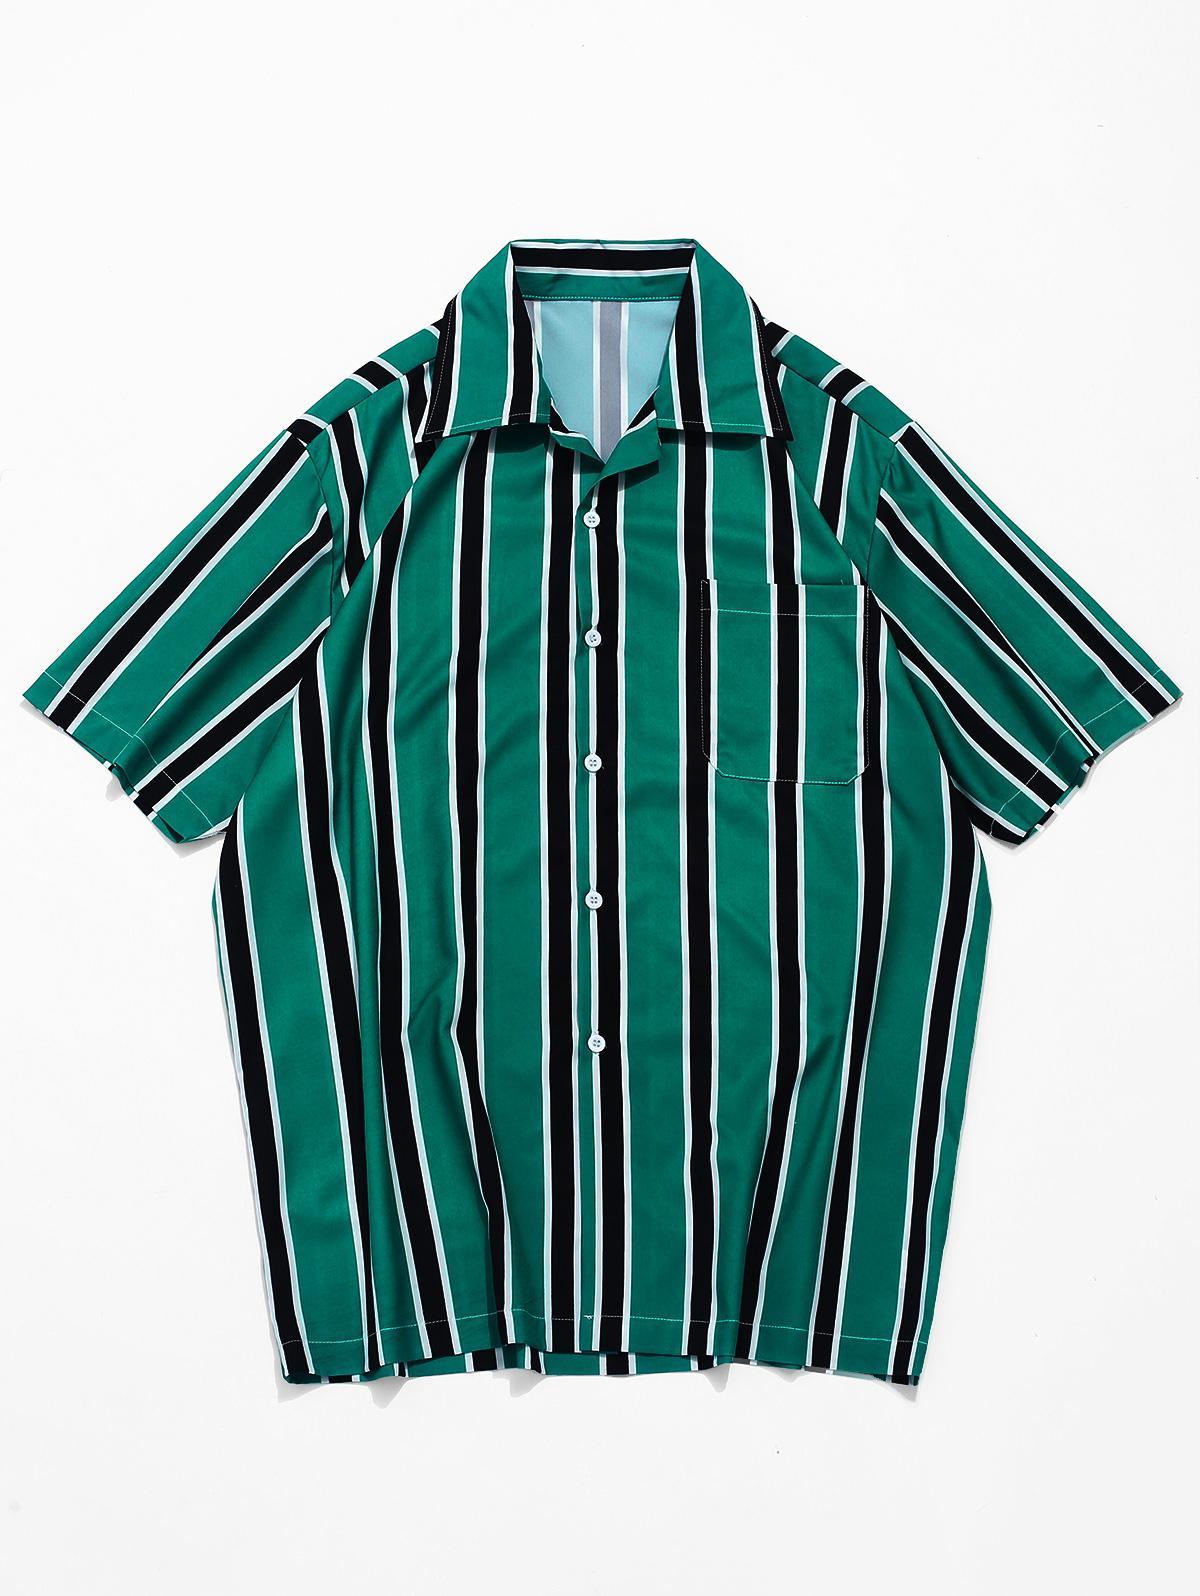 Stripes Print Button Up Casual Shirt, Medium sea green